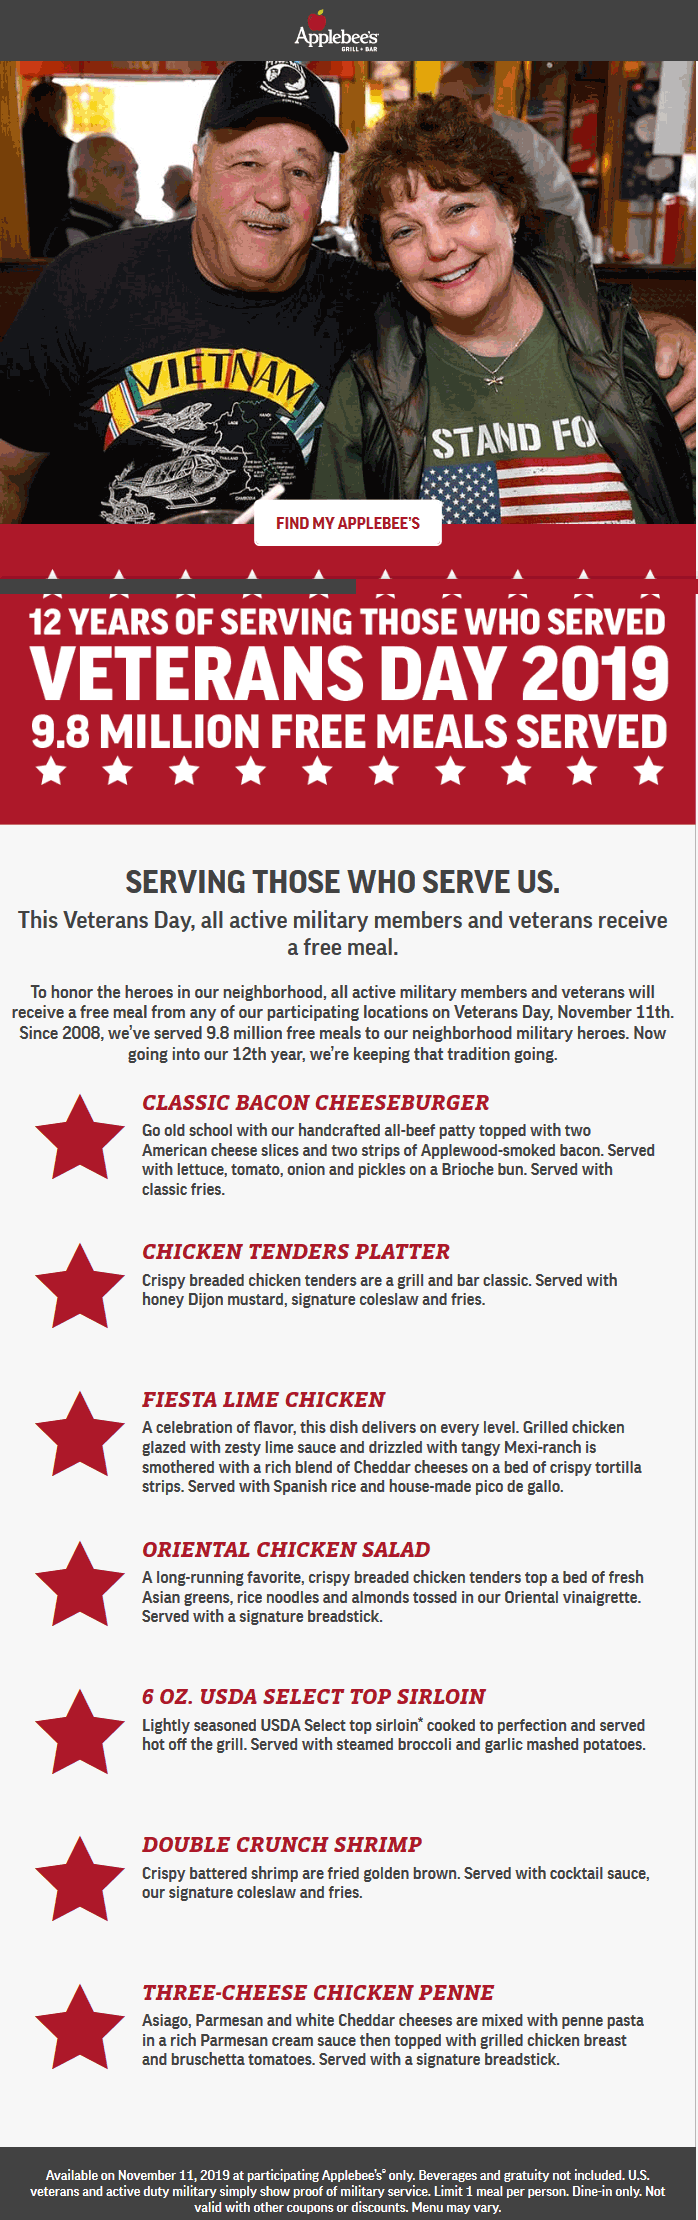 Applebees Coupon November 2019 Active and veterans enjoy a free meal Monday at Applebees